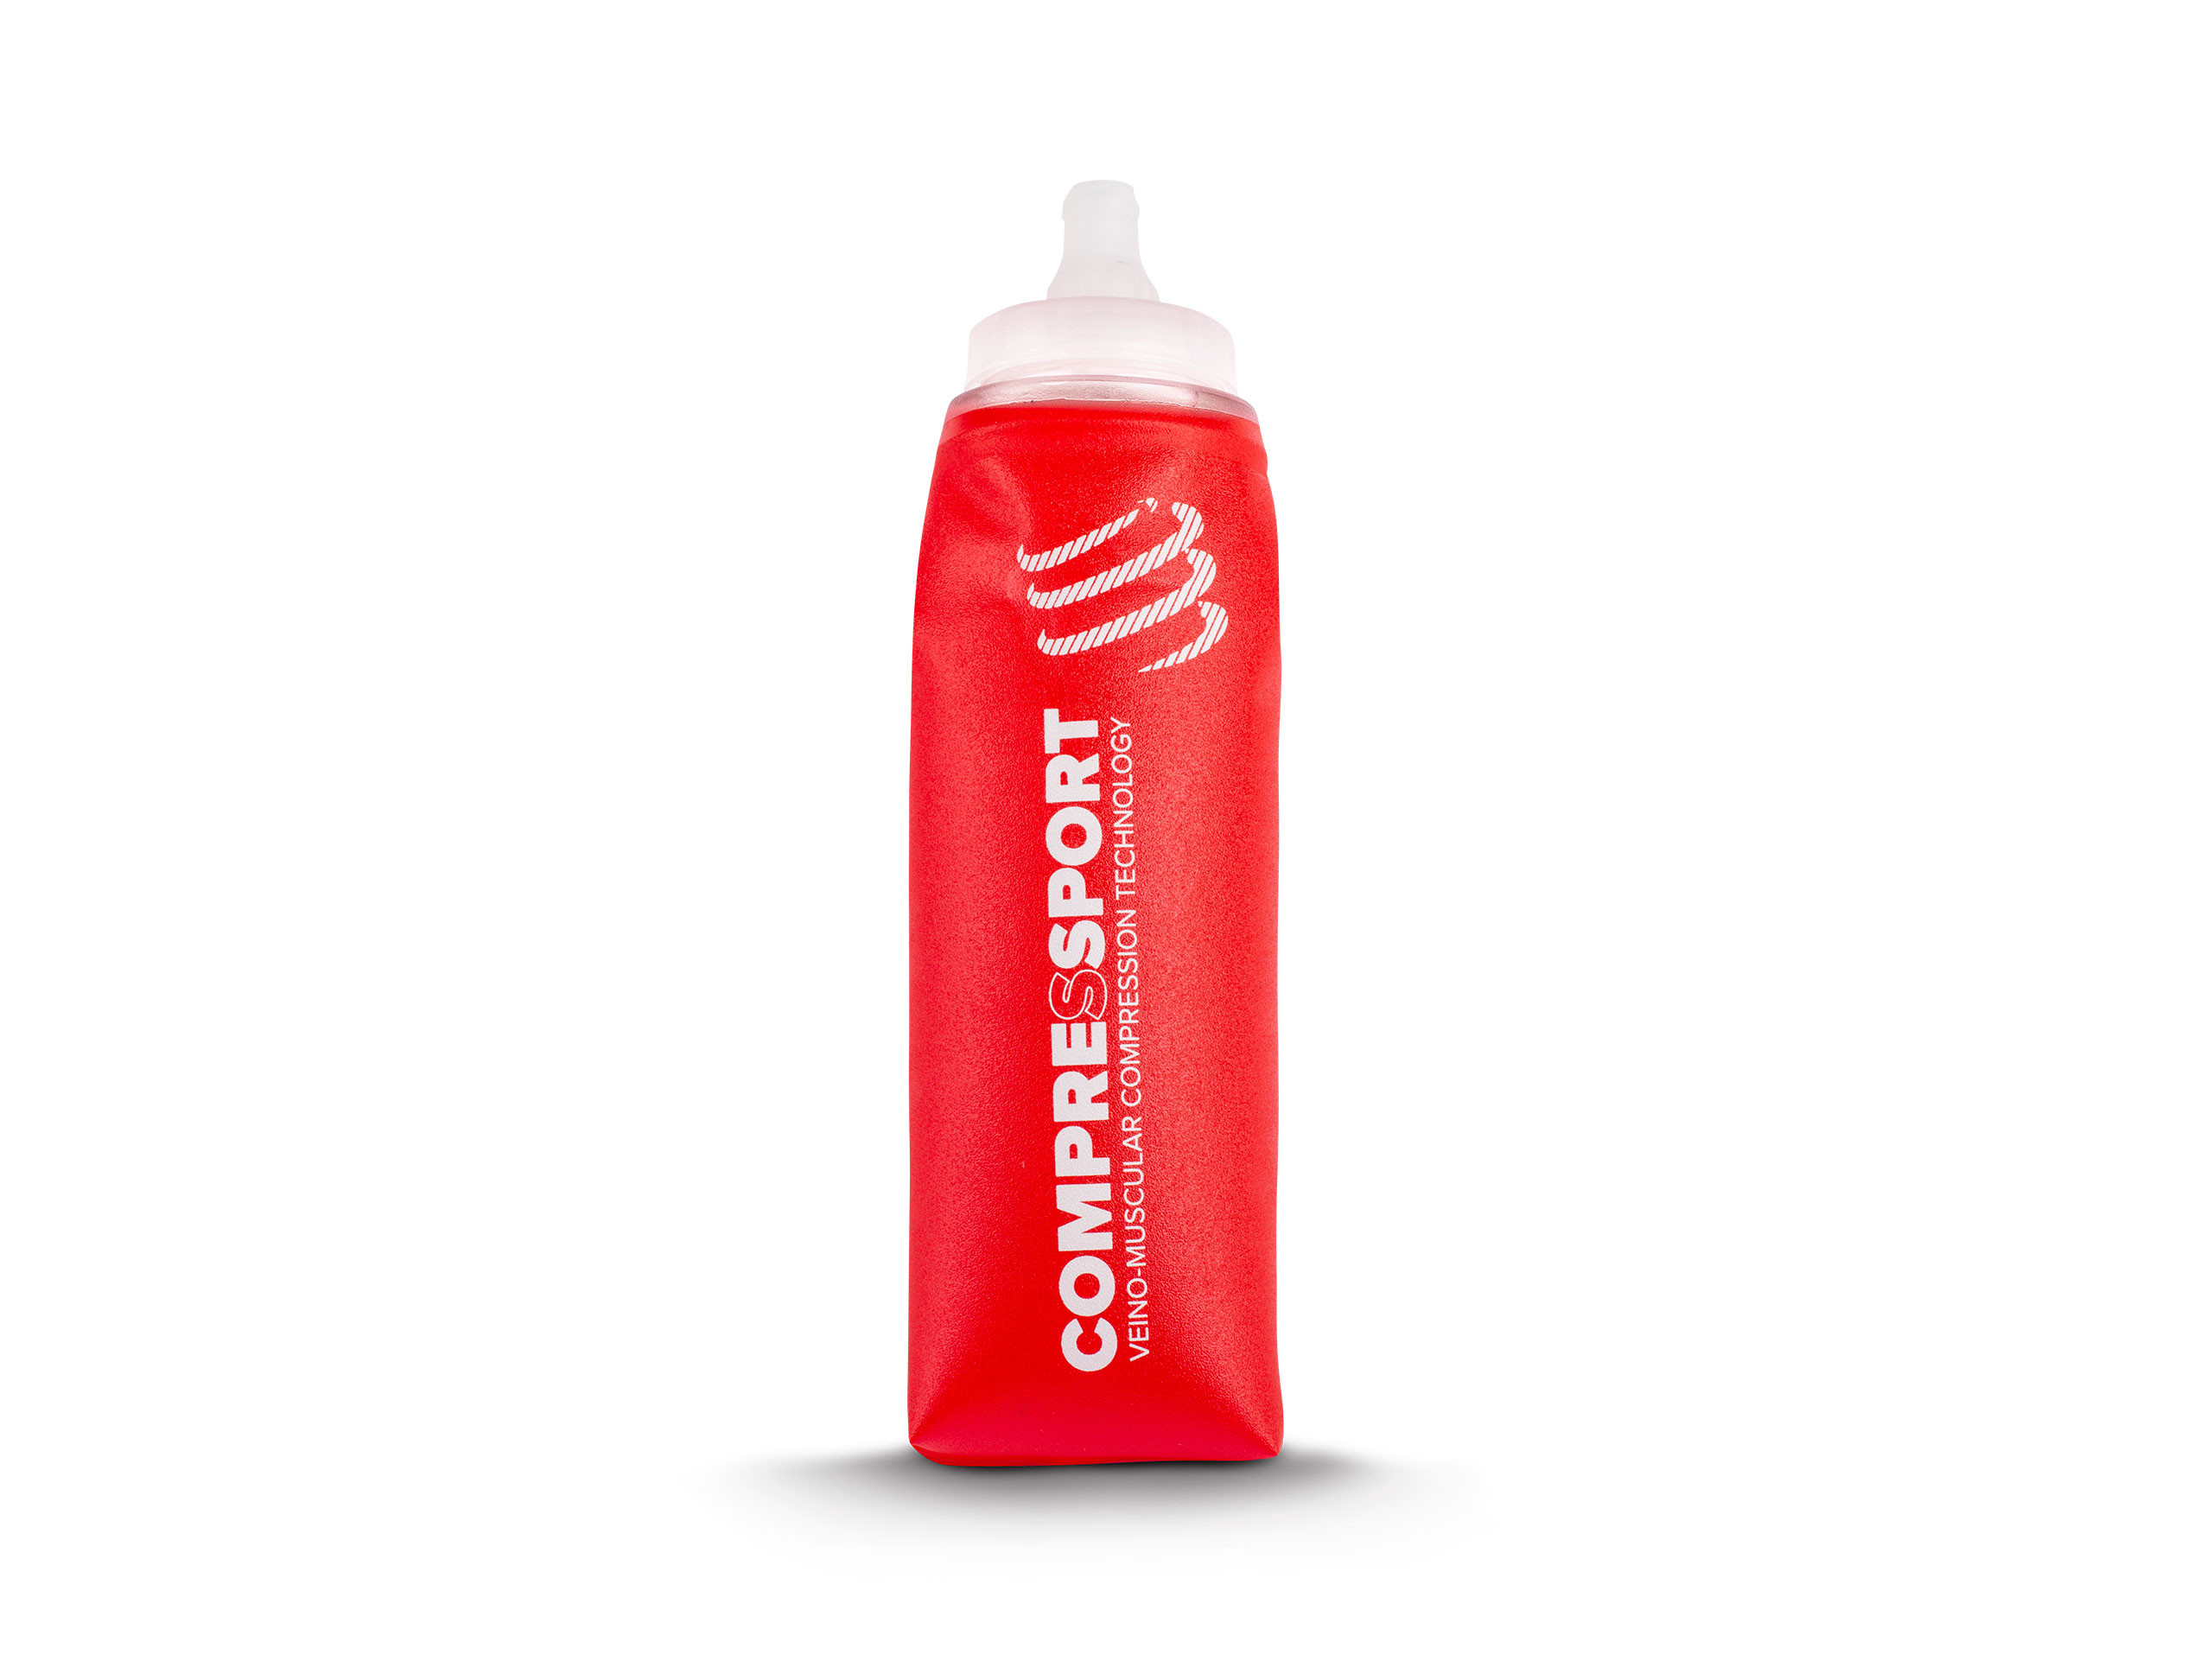 Botella ErgoFlask 600 ml válvula + tubo largo roja